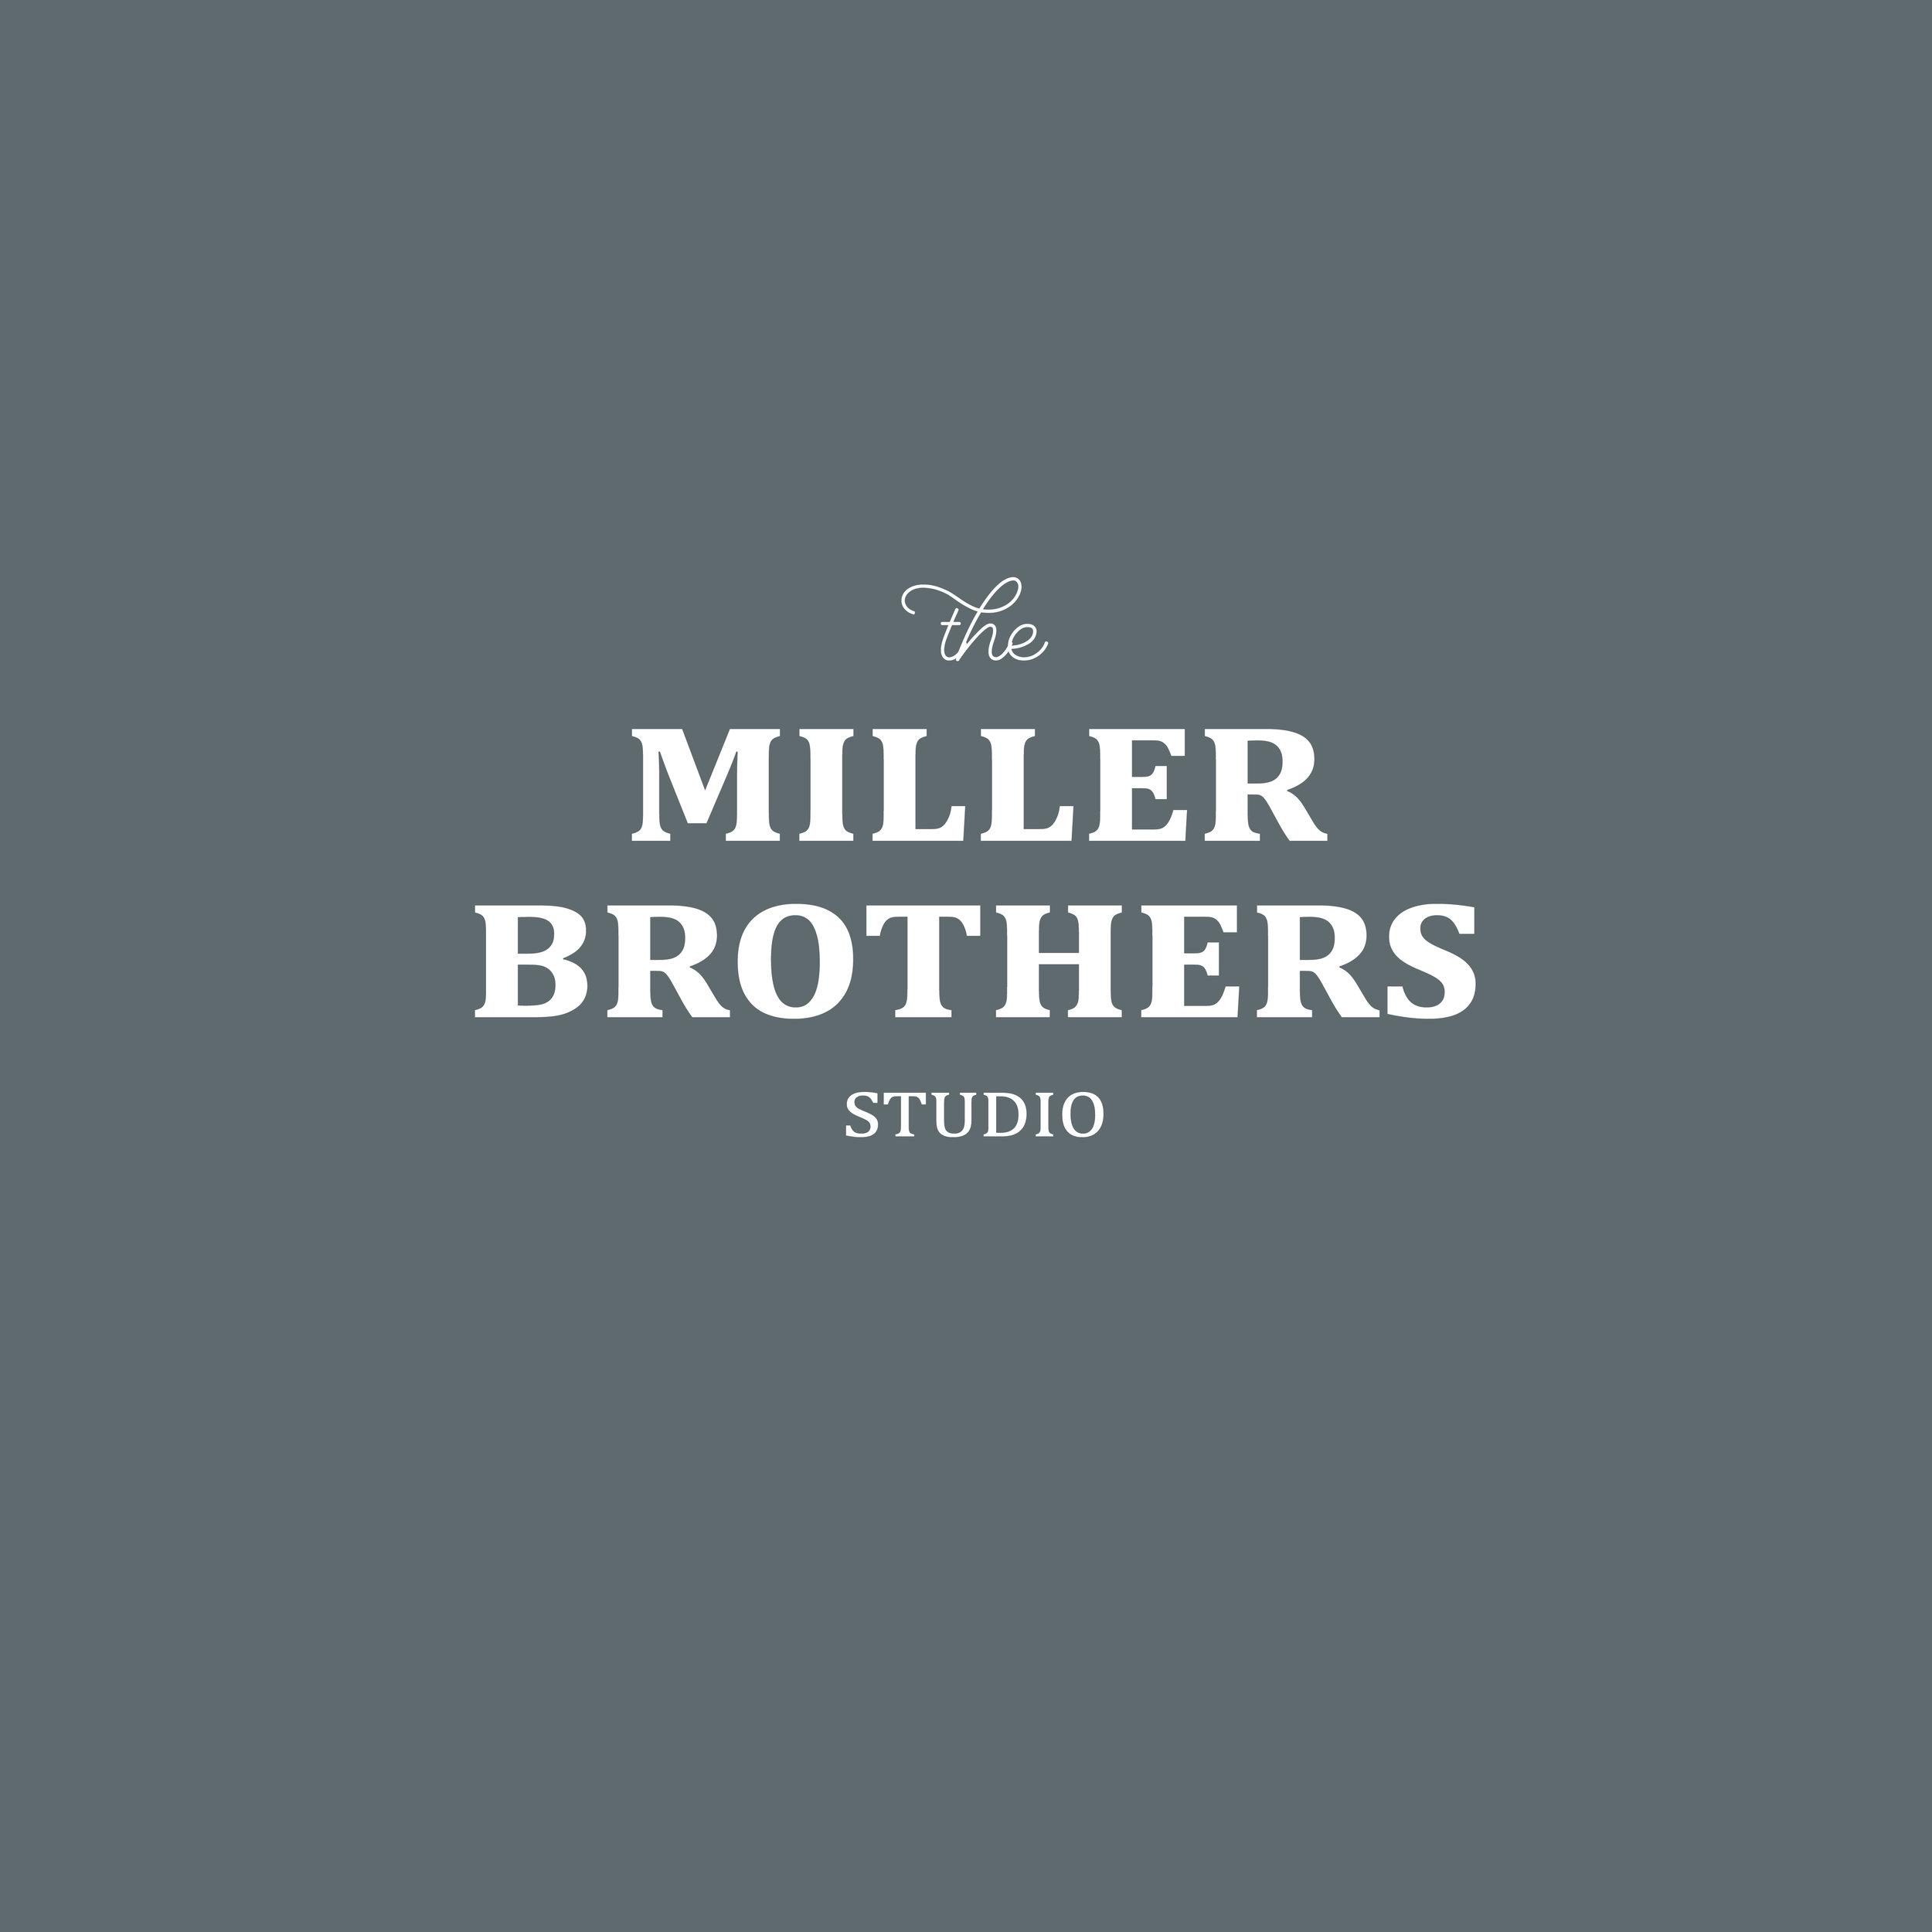 Bros-studio-01.jpg